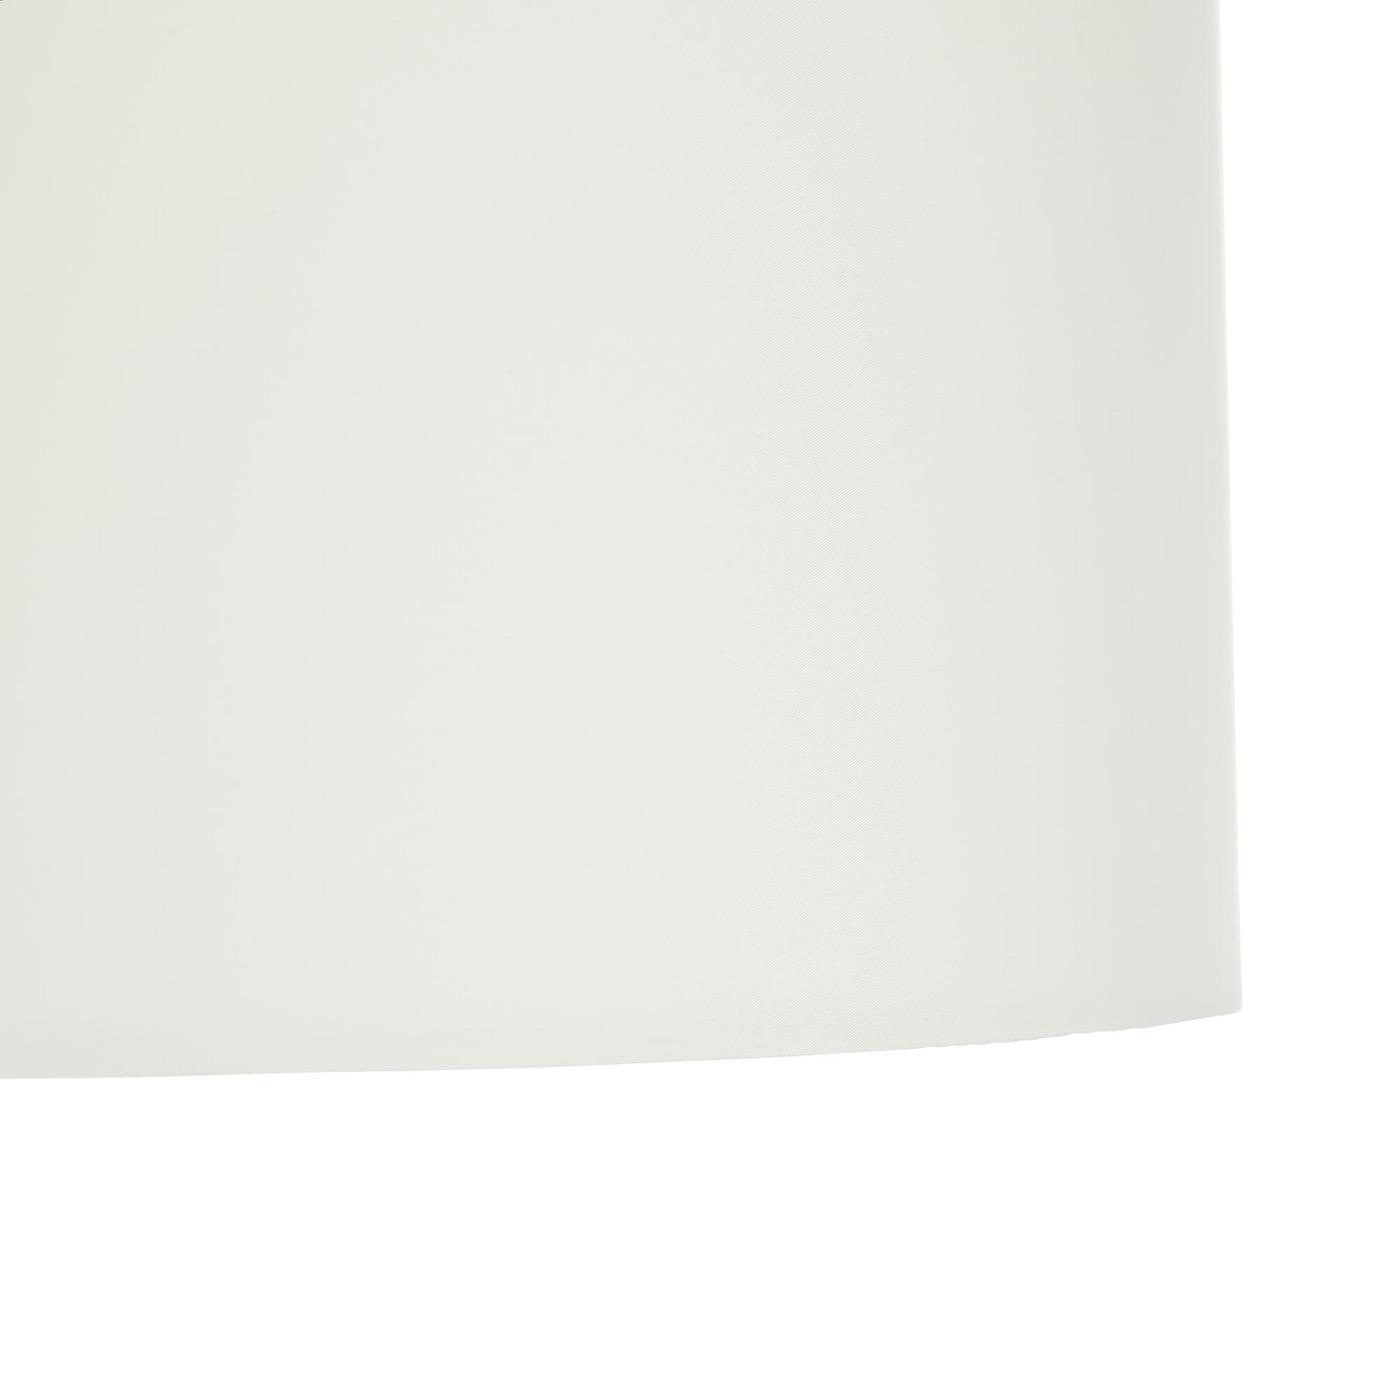 Haley Black & Brass Floor Lamp | Ivory Shade